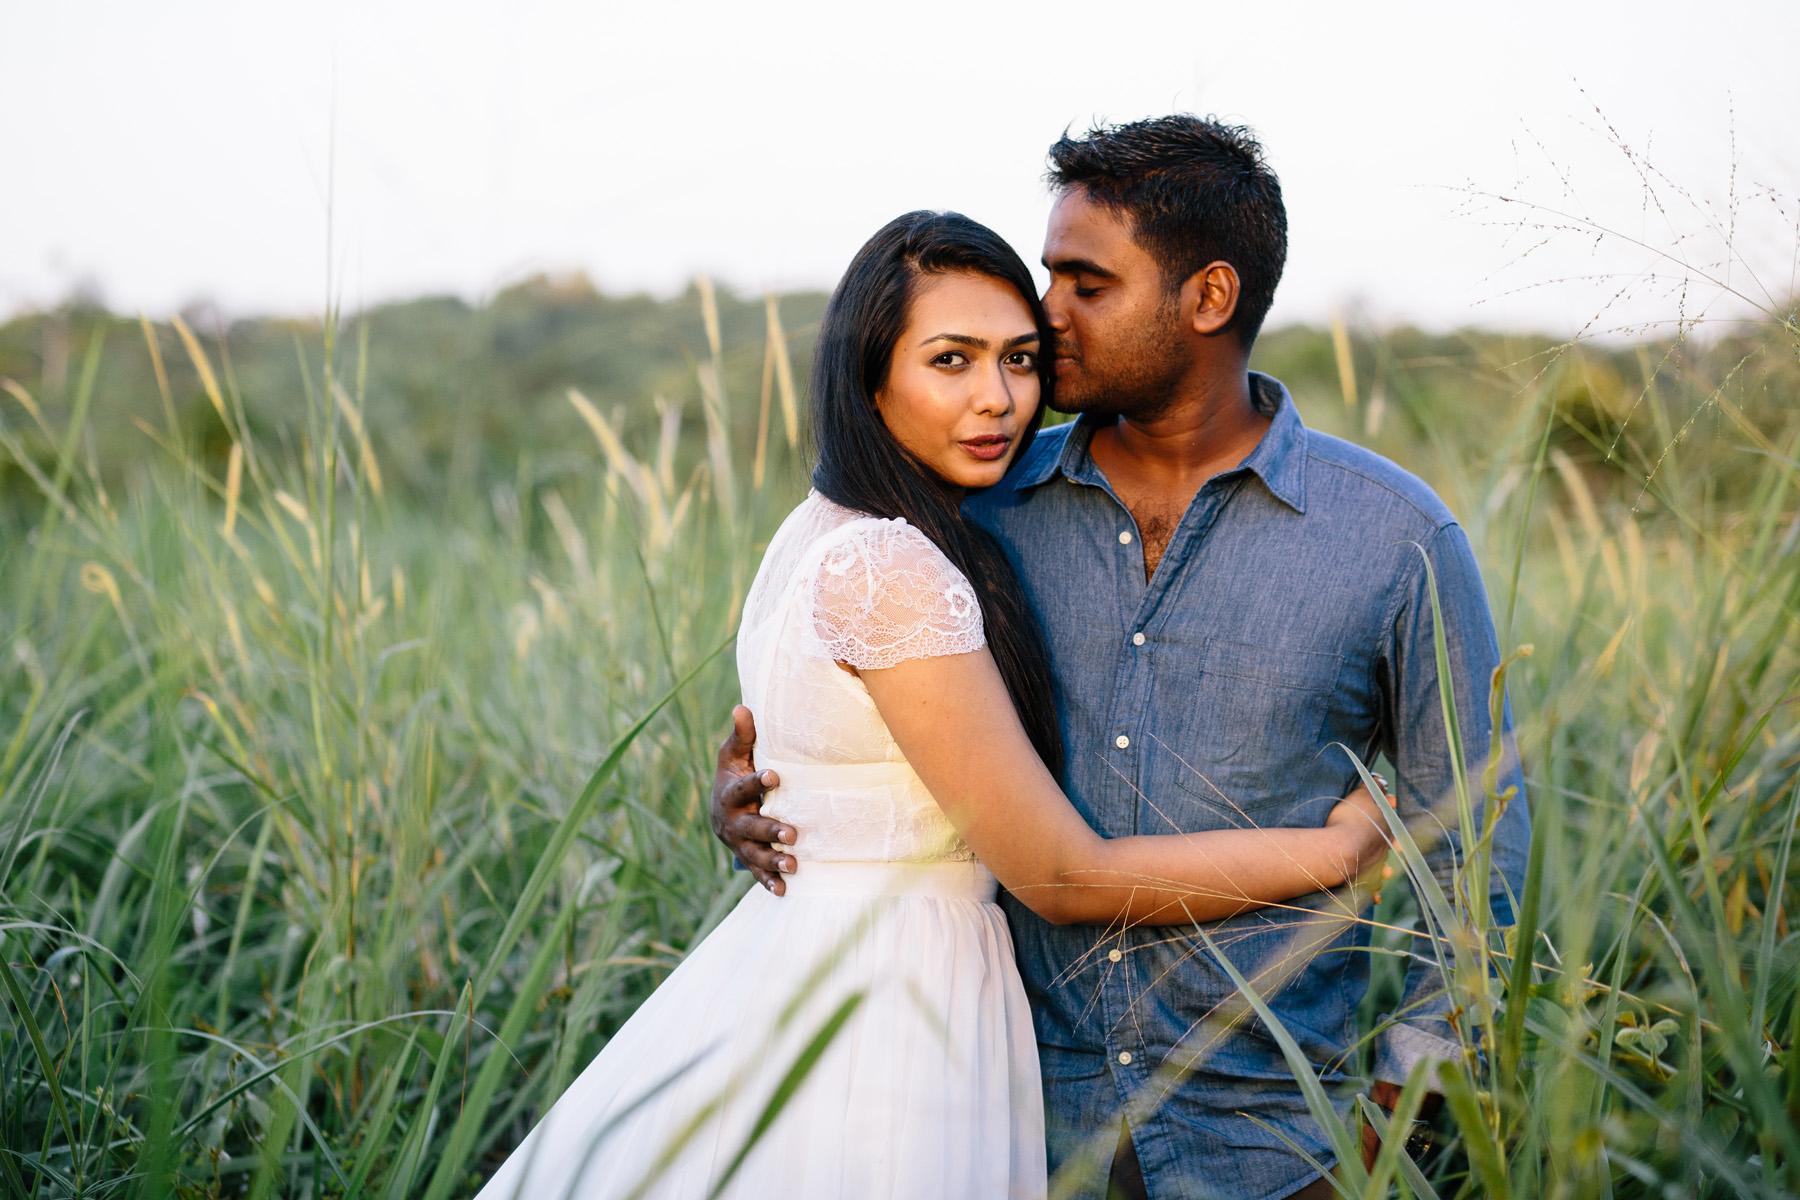 singapore-wedding-travel-photographer-abigail-caleb-wedding-wmt-12.jpg